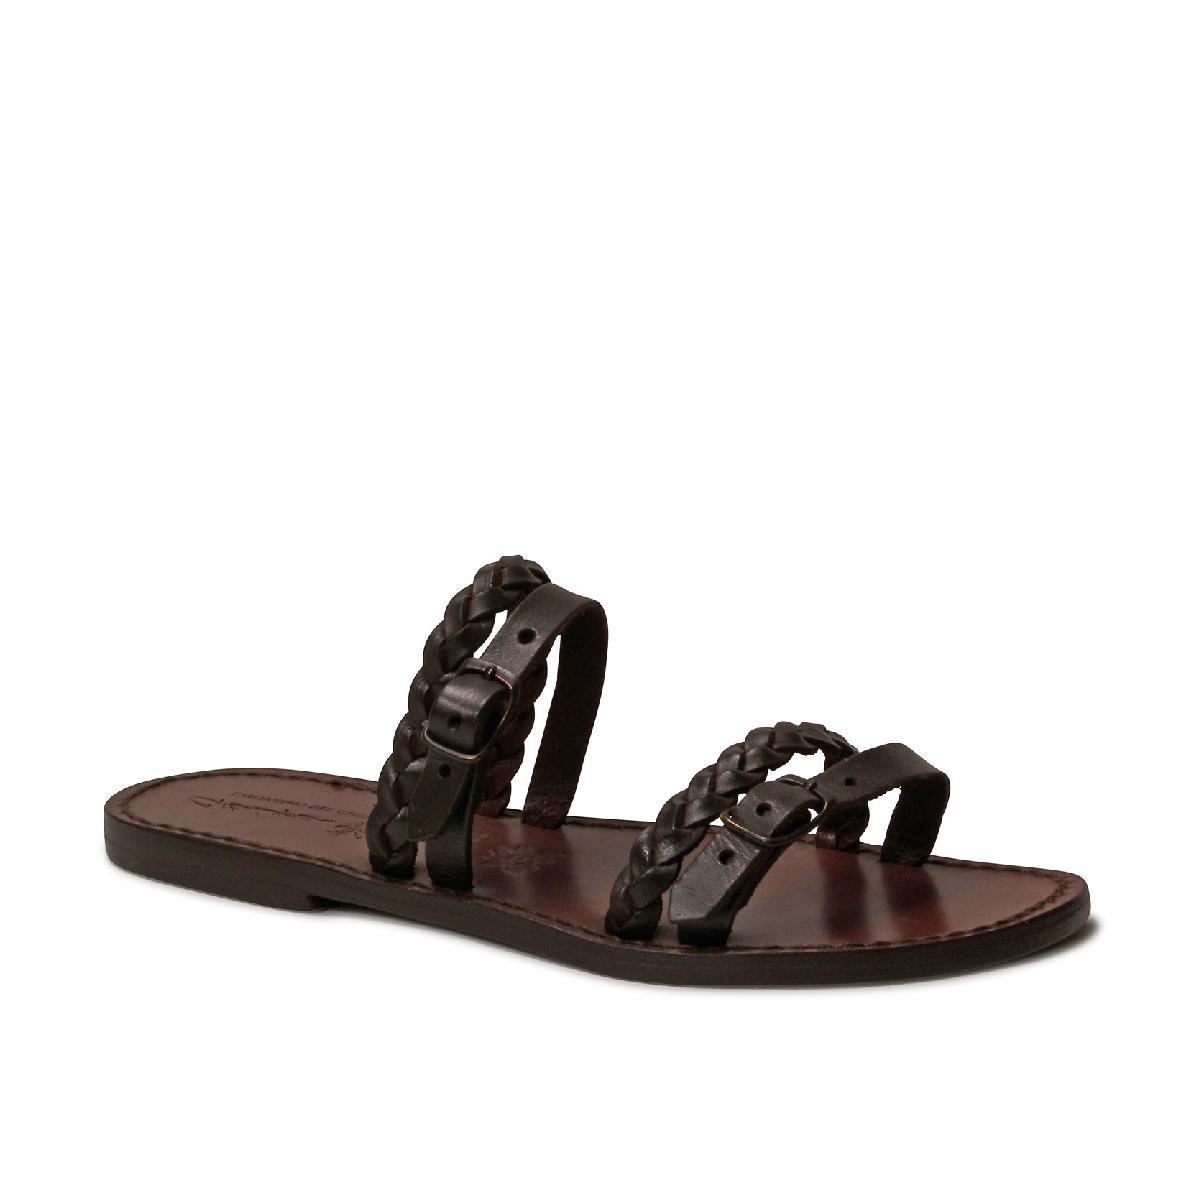 Brilliant Handmade Sandals Leather Sandals Mens Sandals Womens Sandals Mens